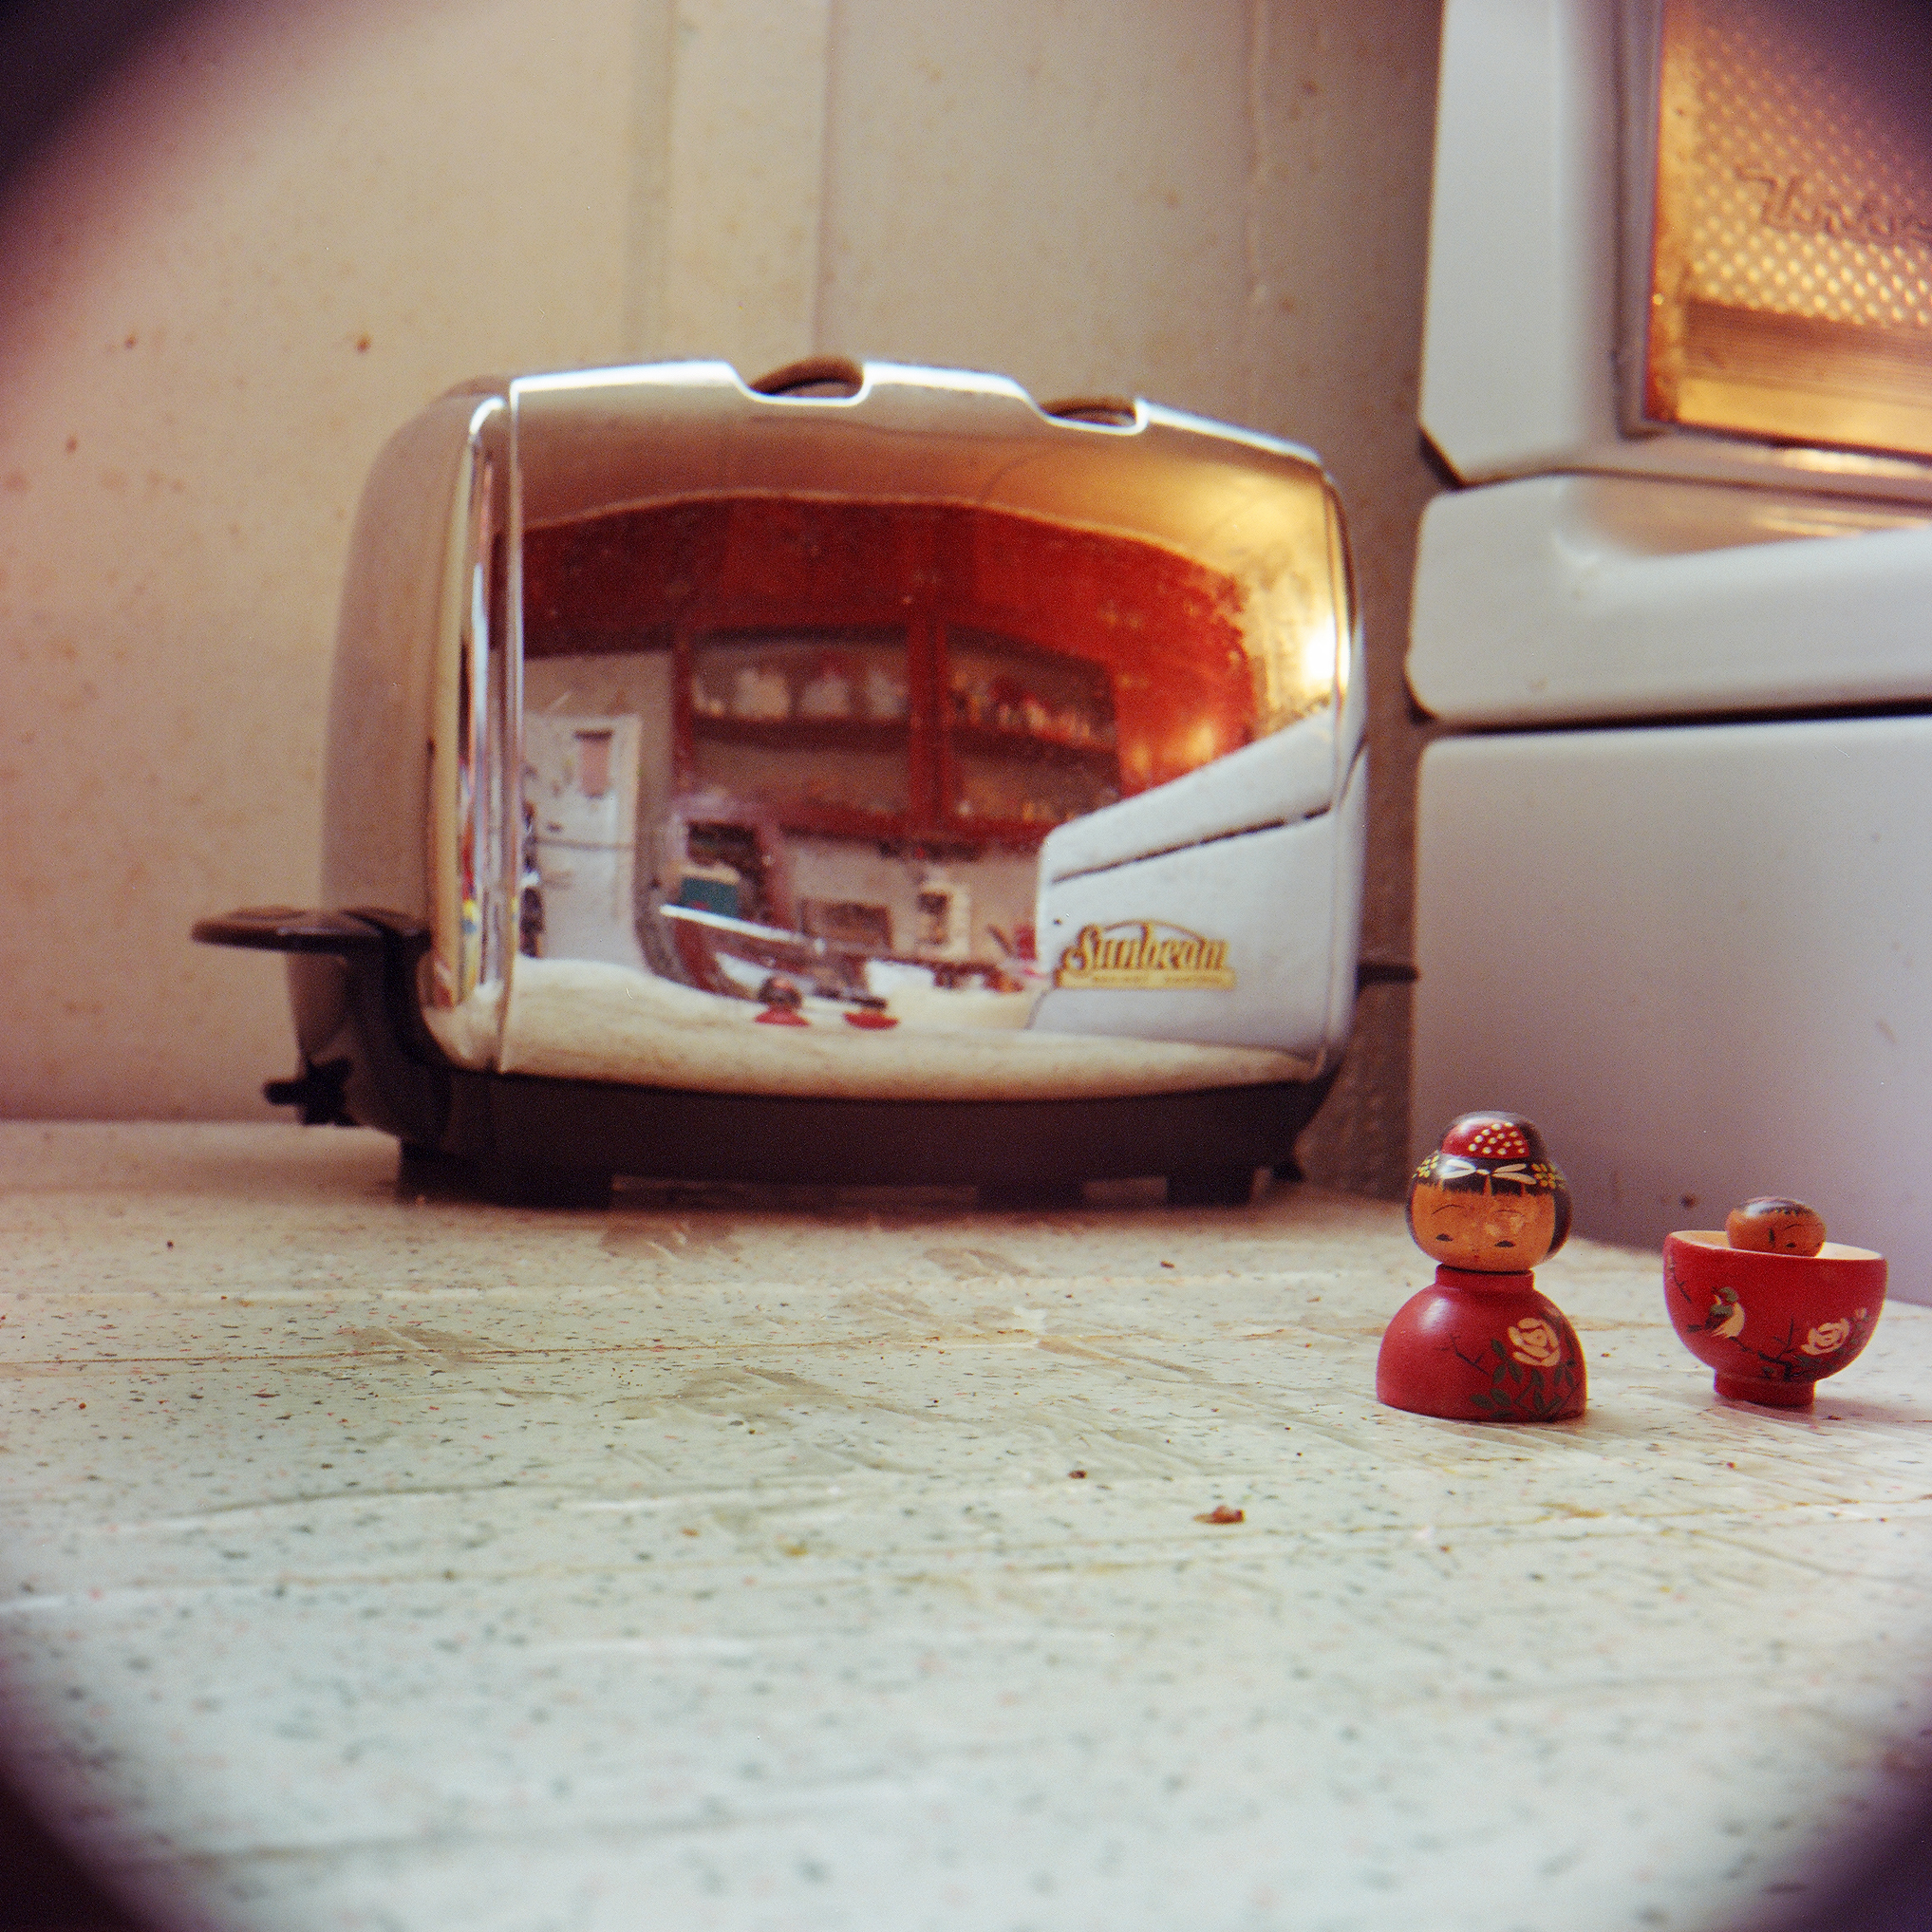 76_doll_toaster.jpg